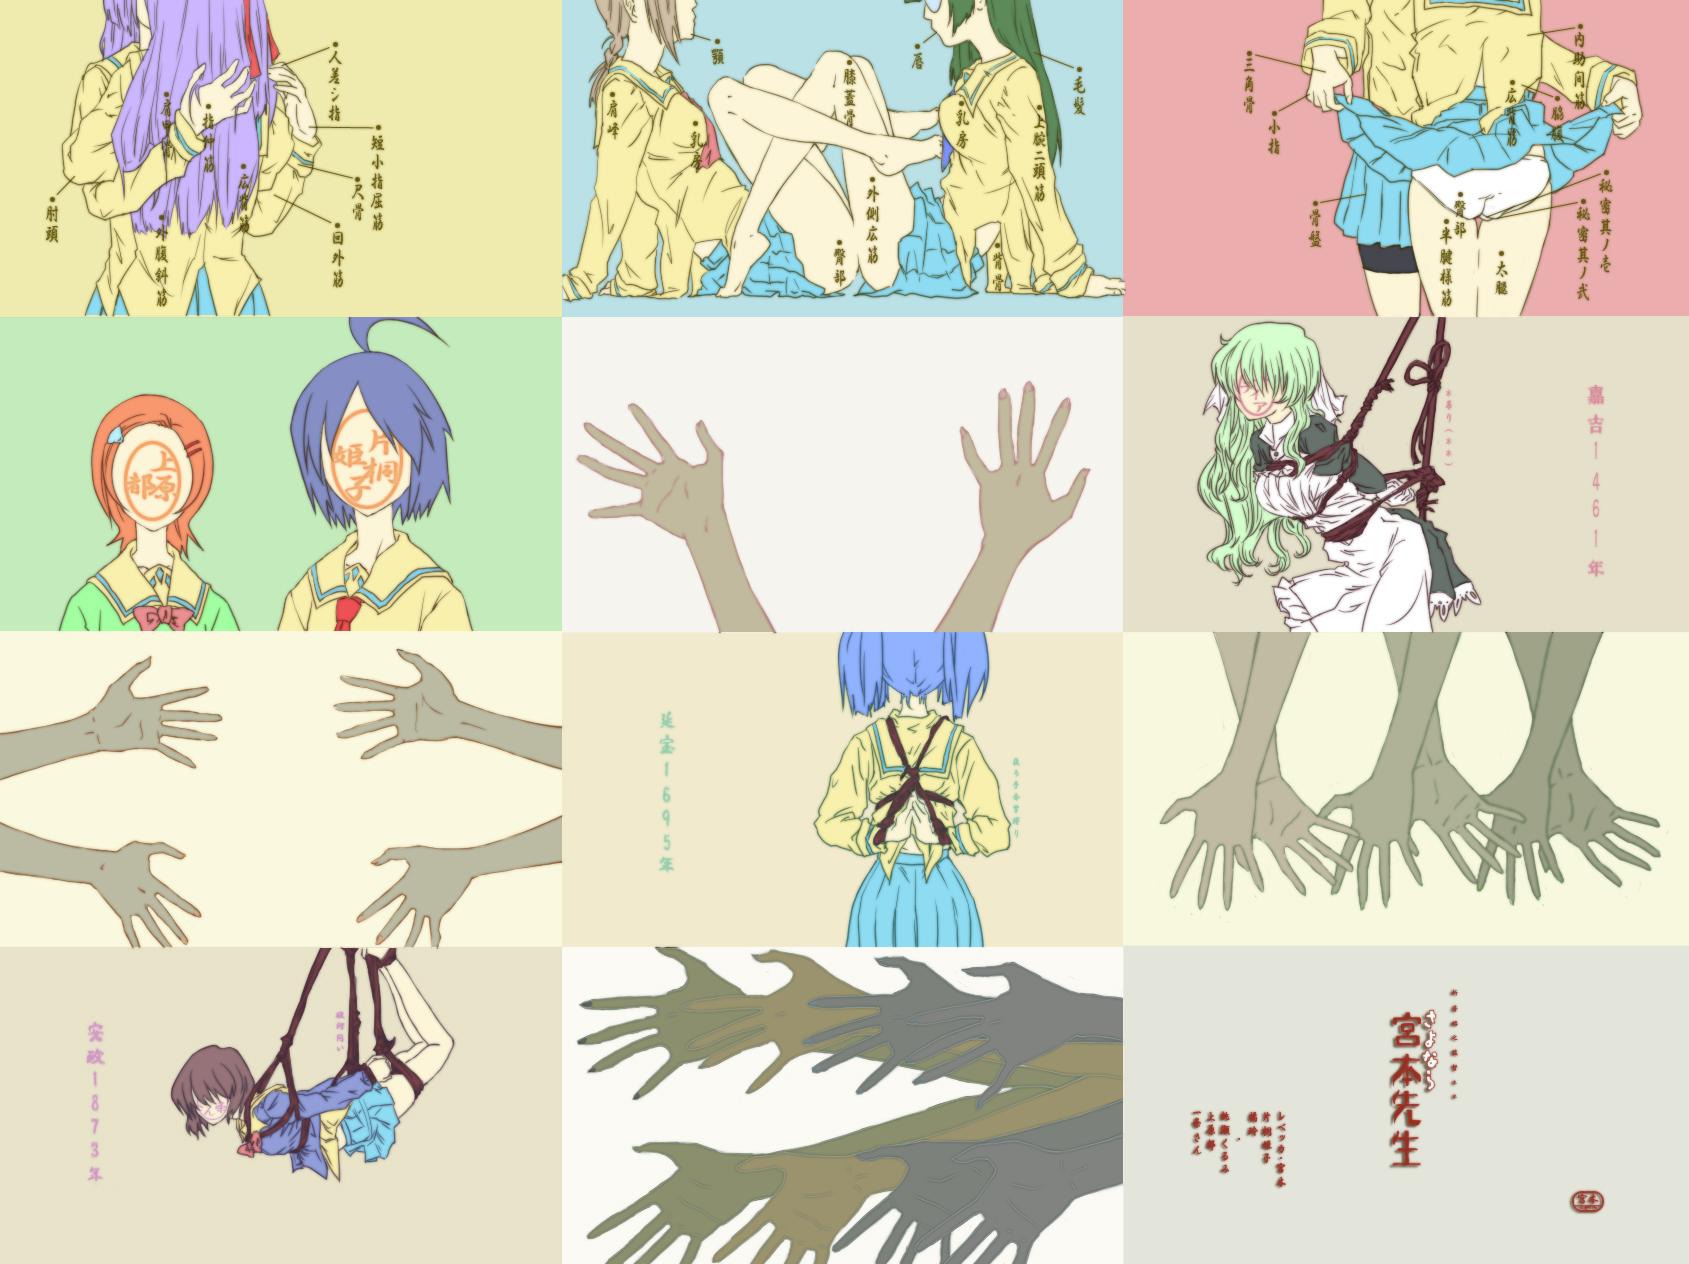 bondage maid pani_poni_dash panties parody sayonara_zetsubou_sensei school_uniform underwear